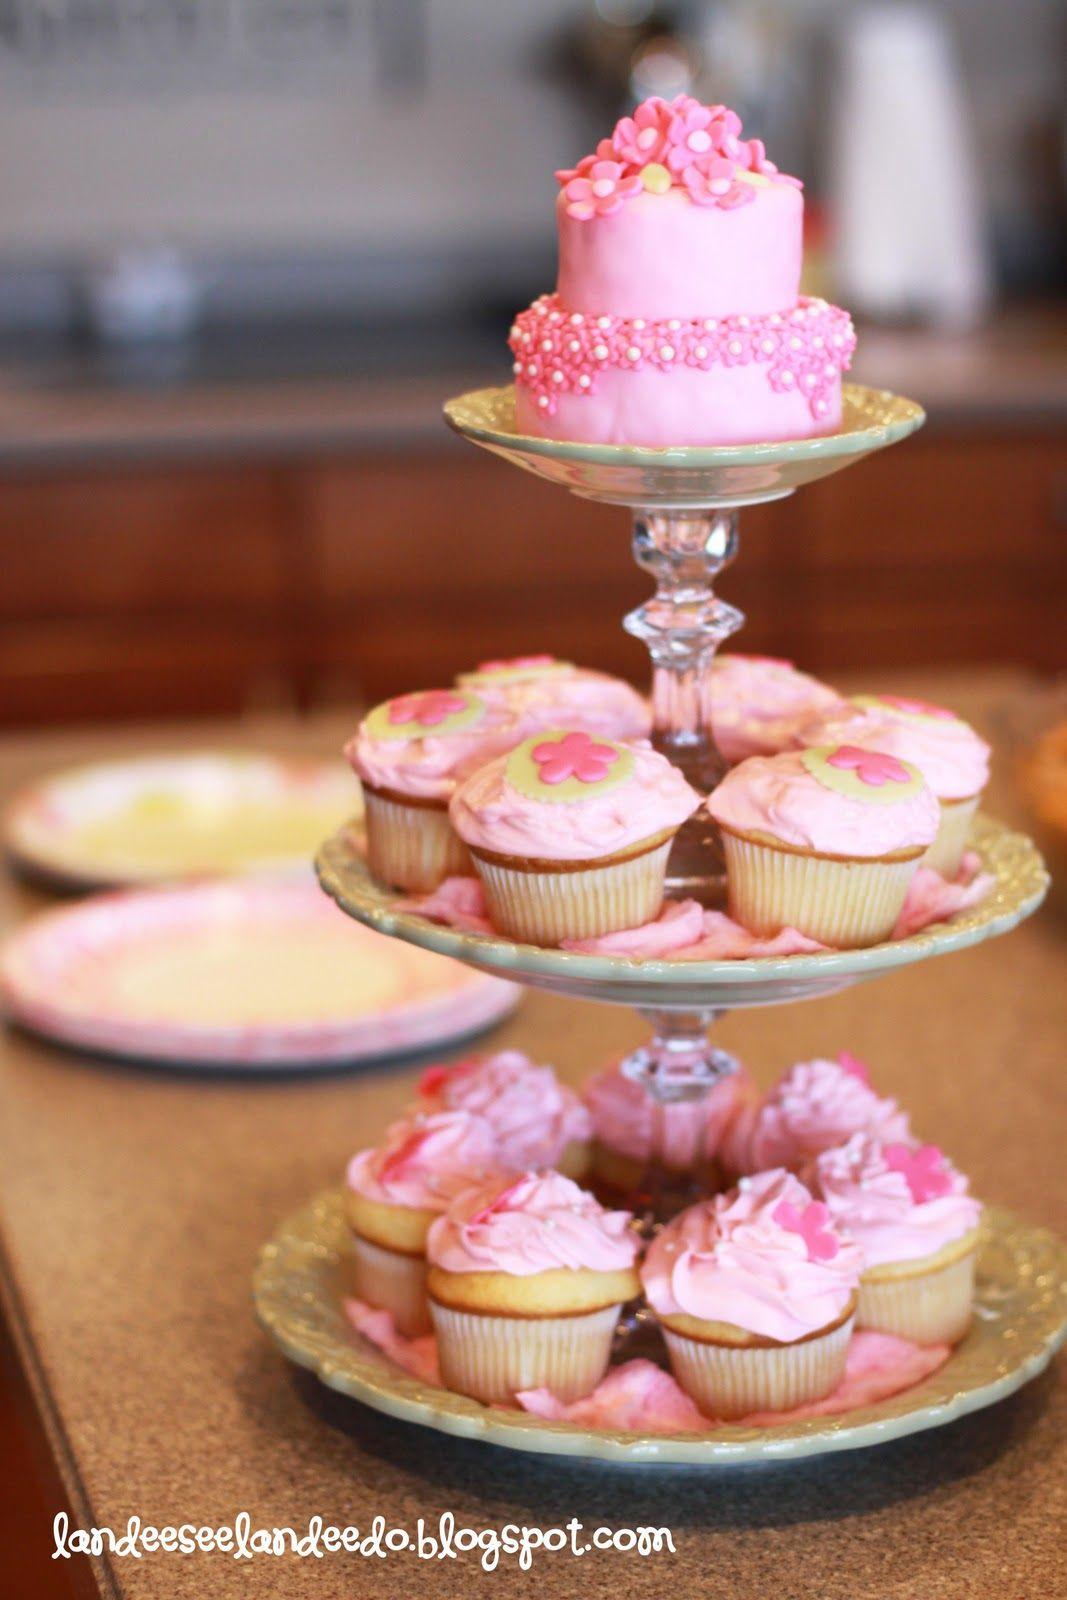 Kate and Elliot wedding cake | Kate and Elliots wedding | Pinterest ...